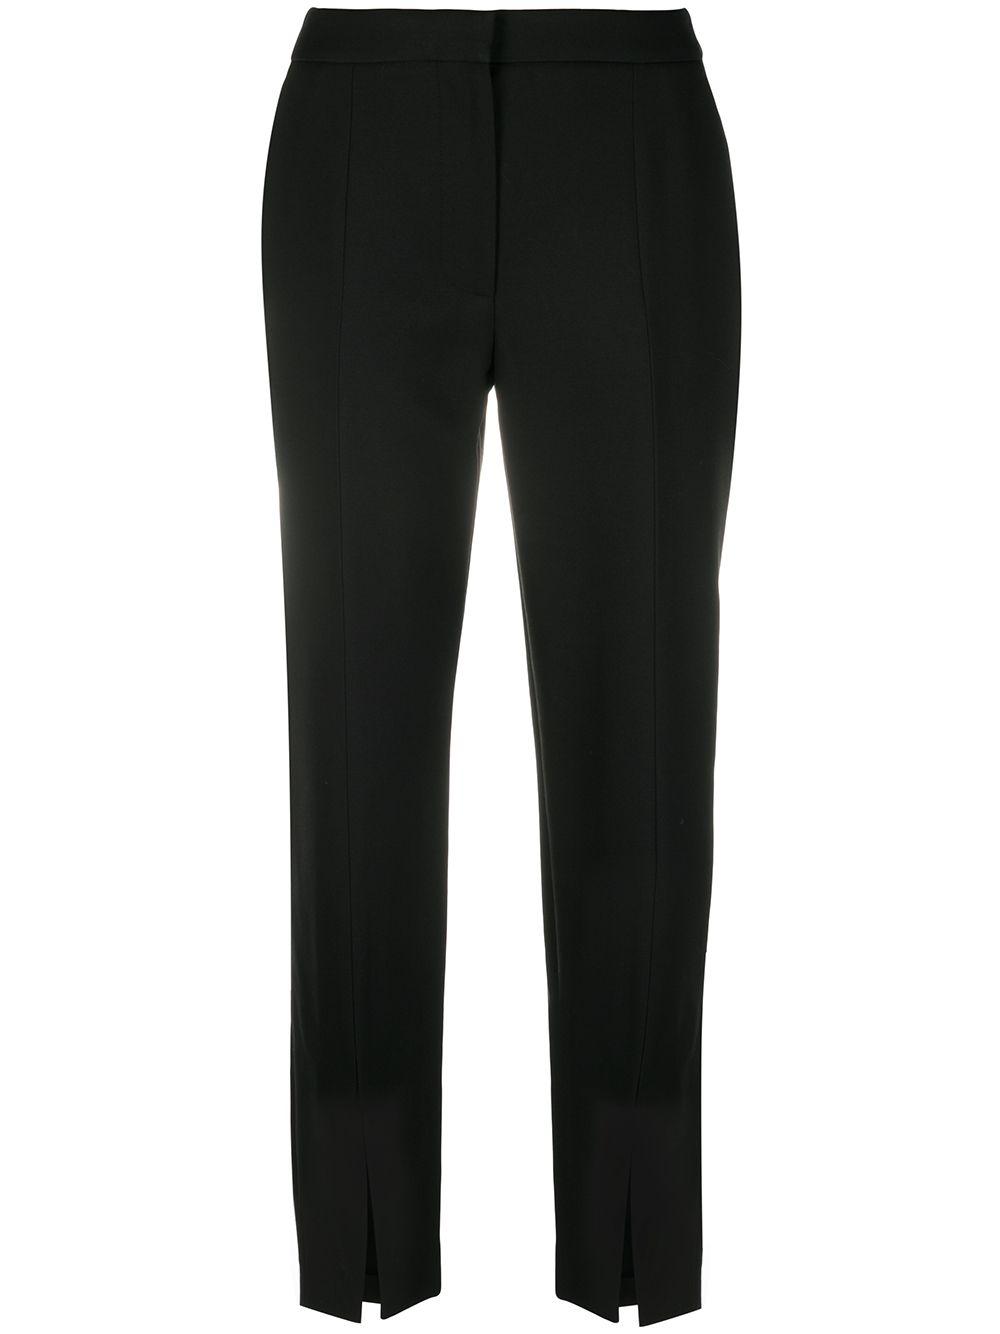 Wool Silk Blend Trousers